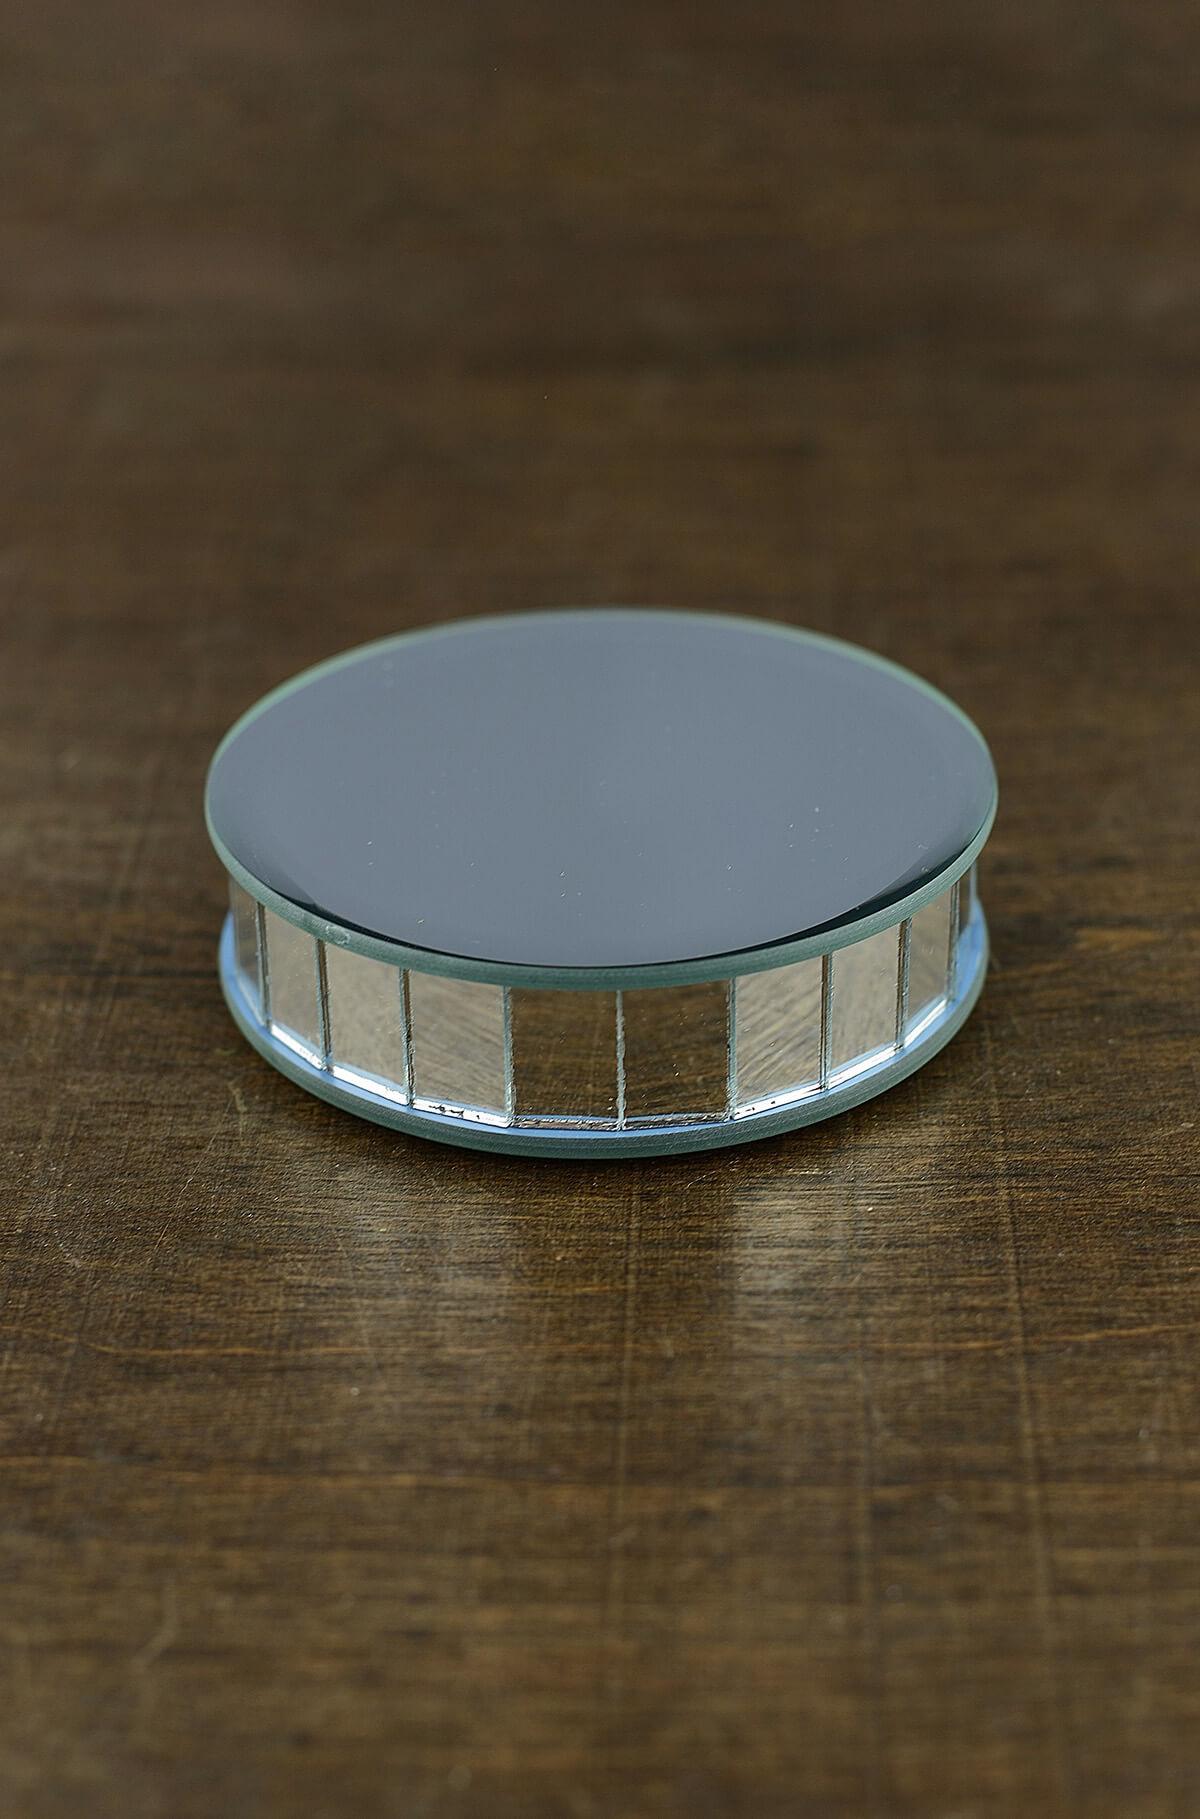 4 Quot Mirror Riser Round Display